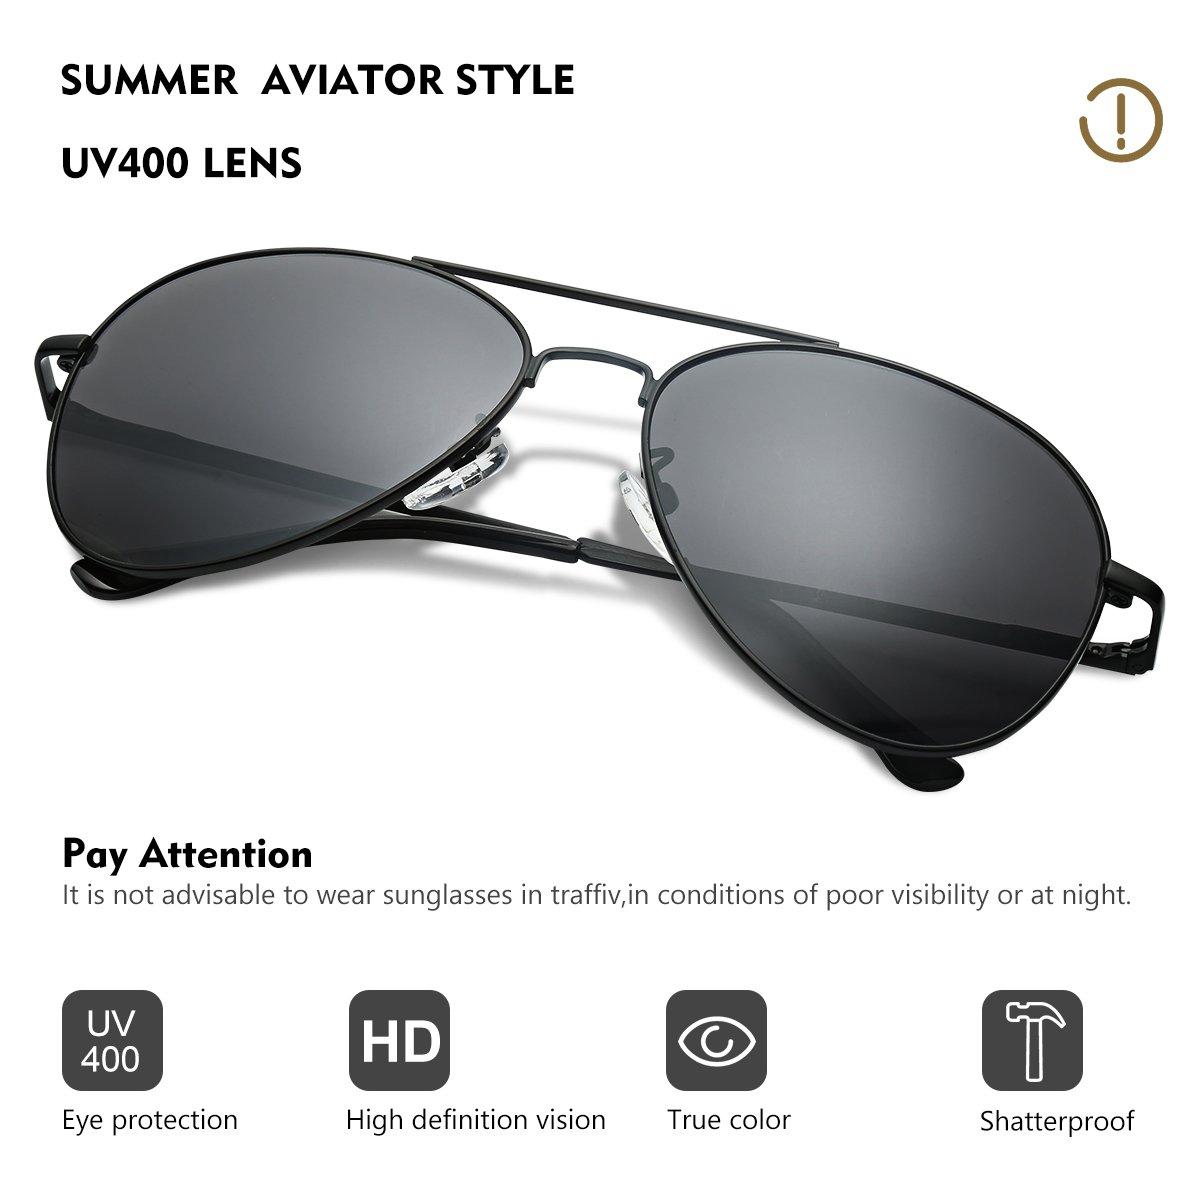 aebe5950b Amazon.com: Duduma Premium Classic Aviator Sunglasses with Metal Frame Uv400  Protection: Sports & Outdoors